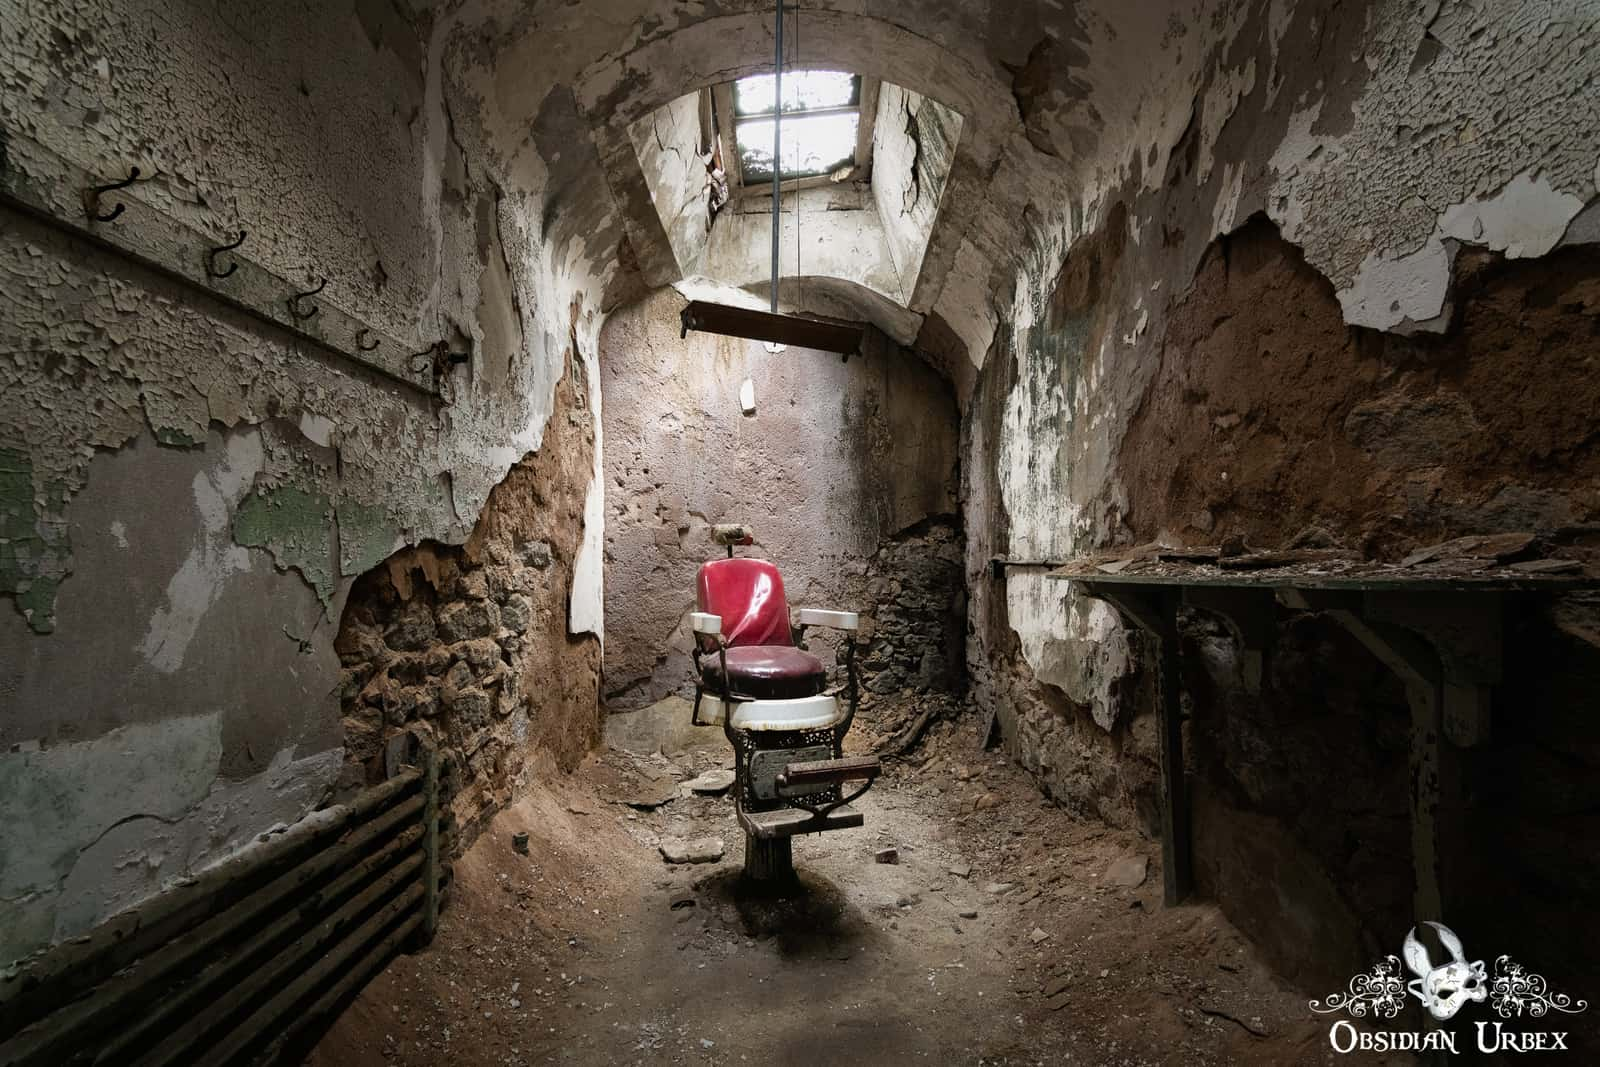 Eastern State Penitentiary Usa Obsidian Urbex